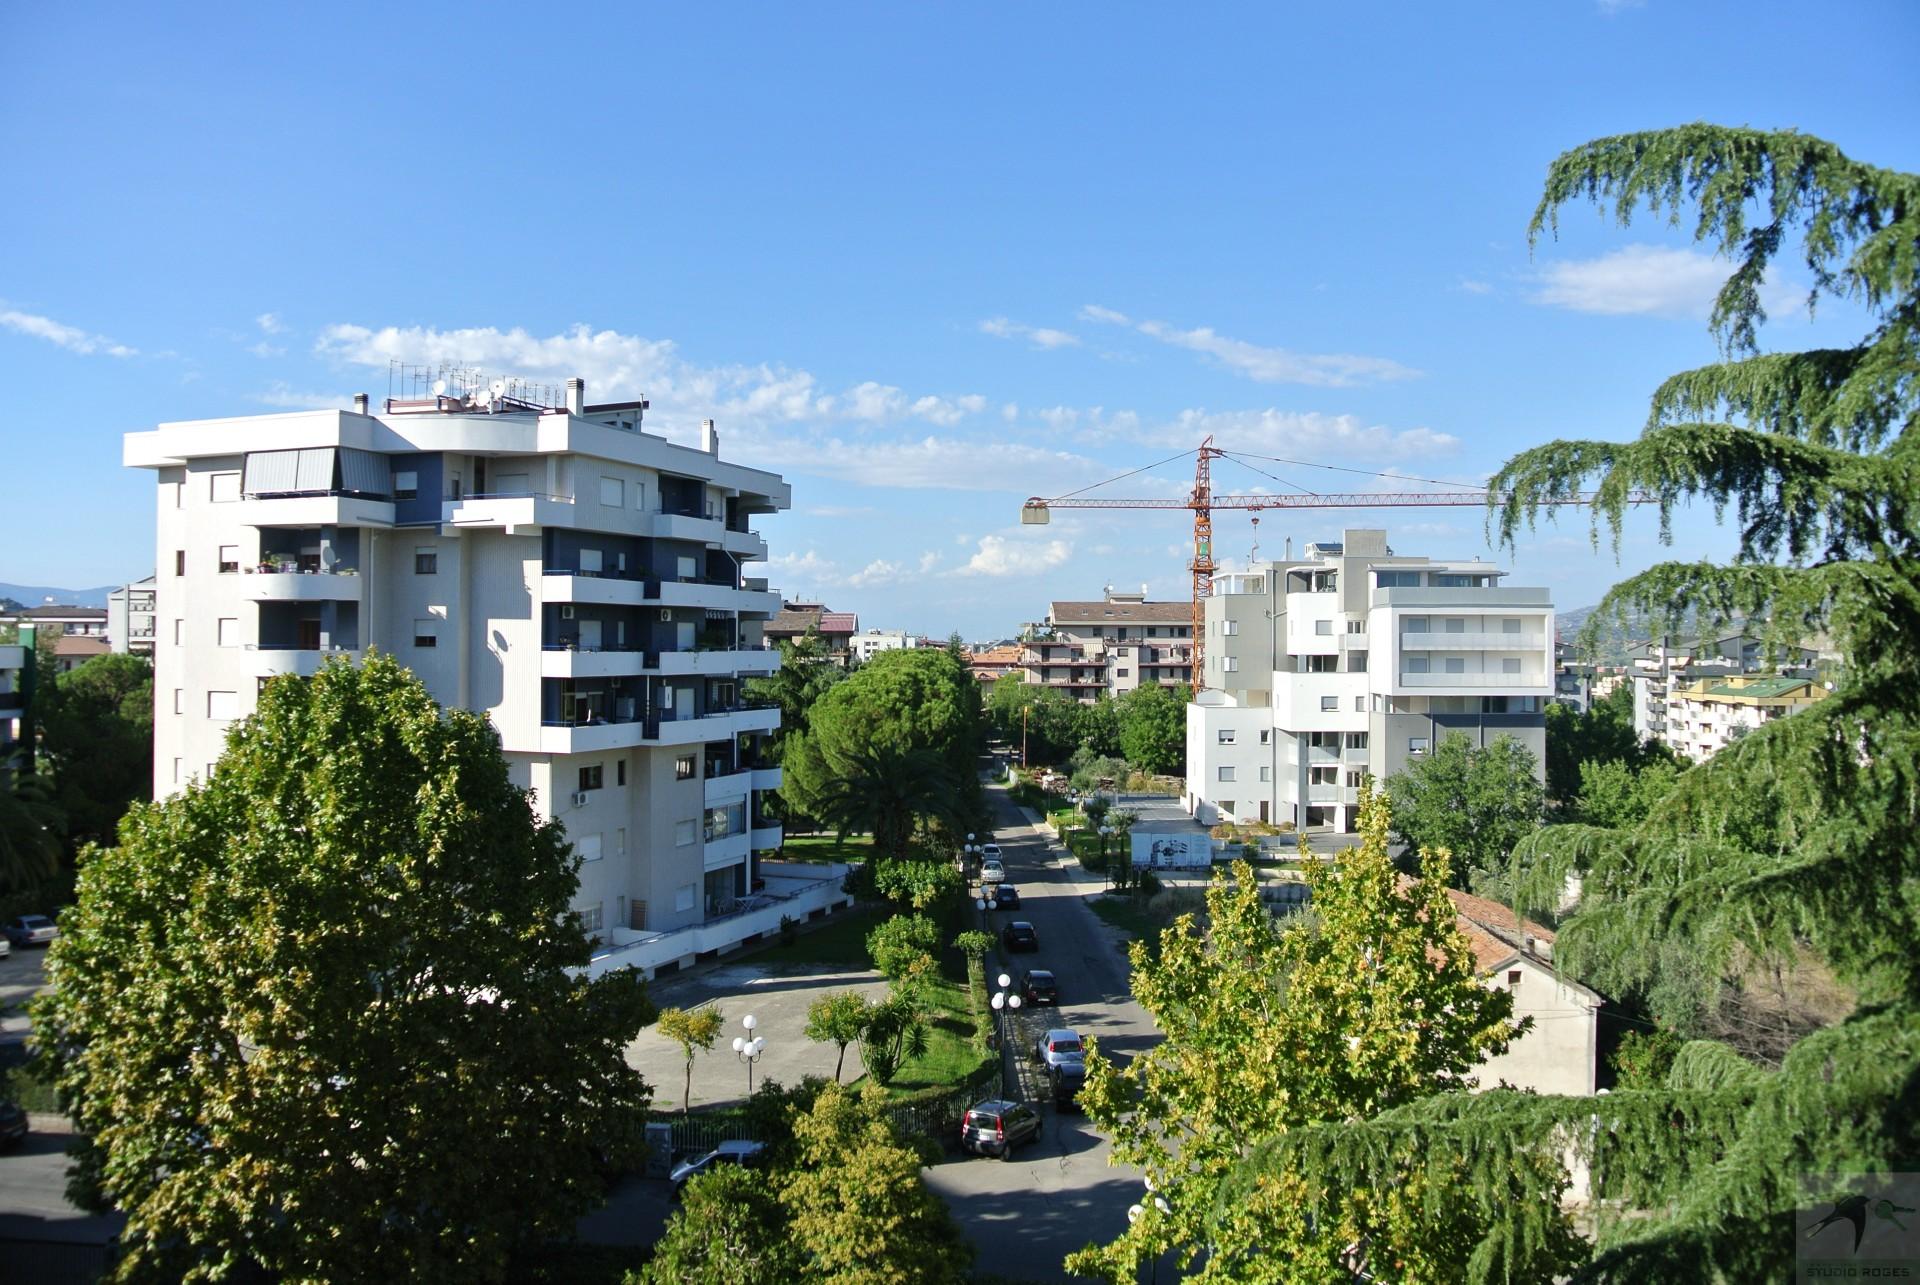 Appartamento in Vendita 111,97 mq - N. camere: 3 - - Rende - Roges-Commenda (CS)